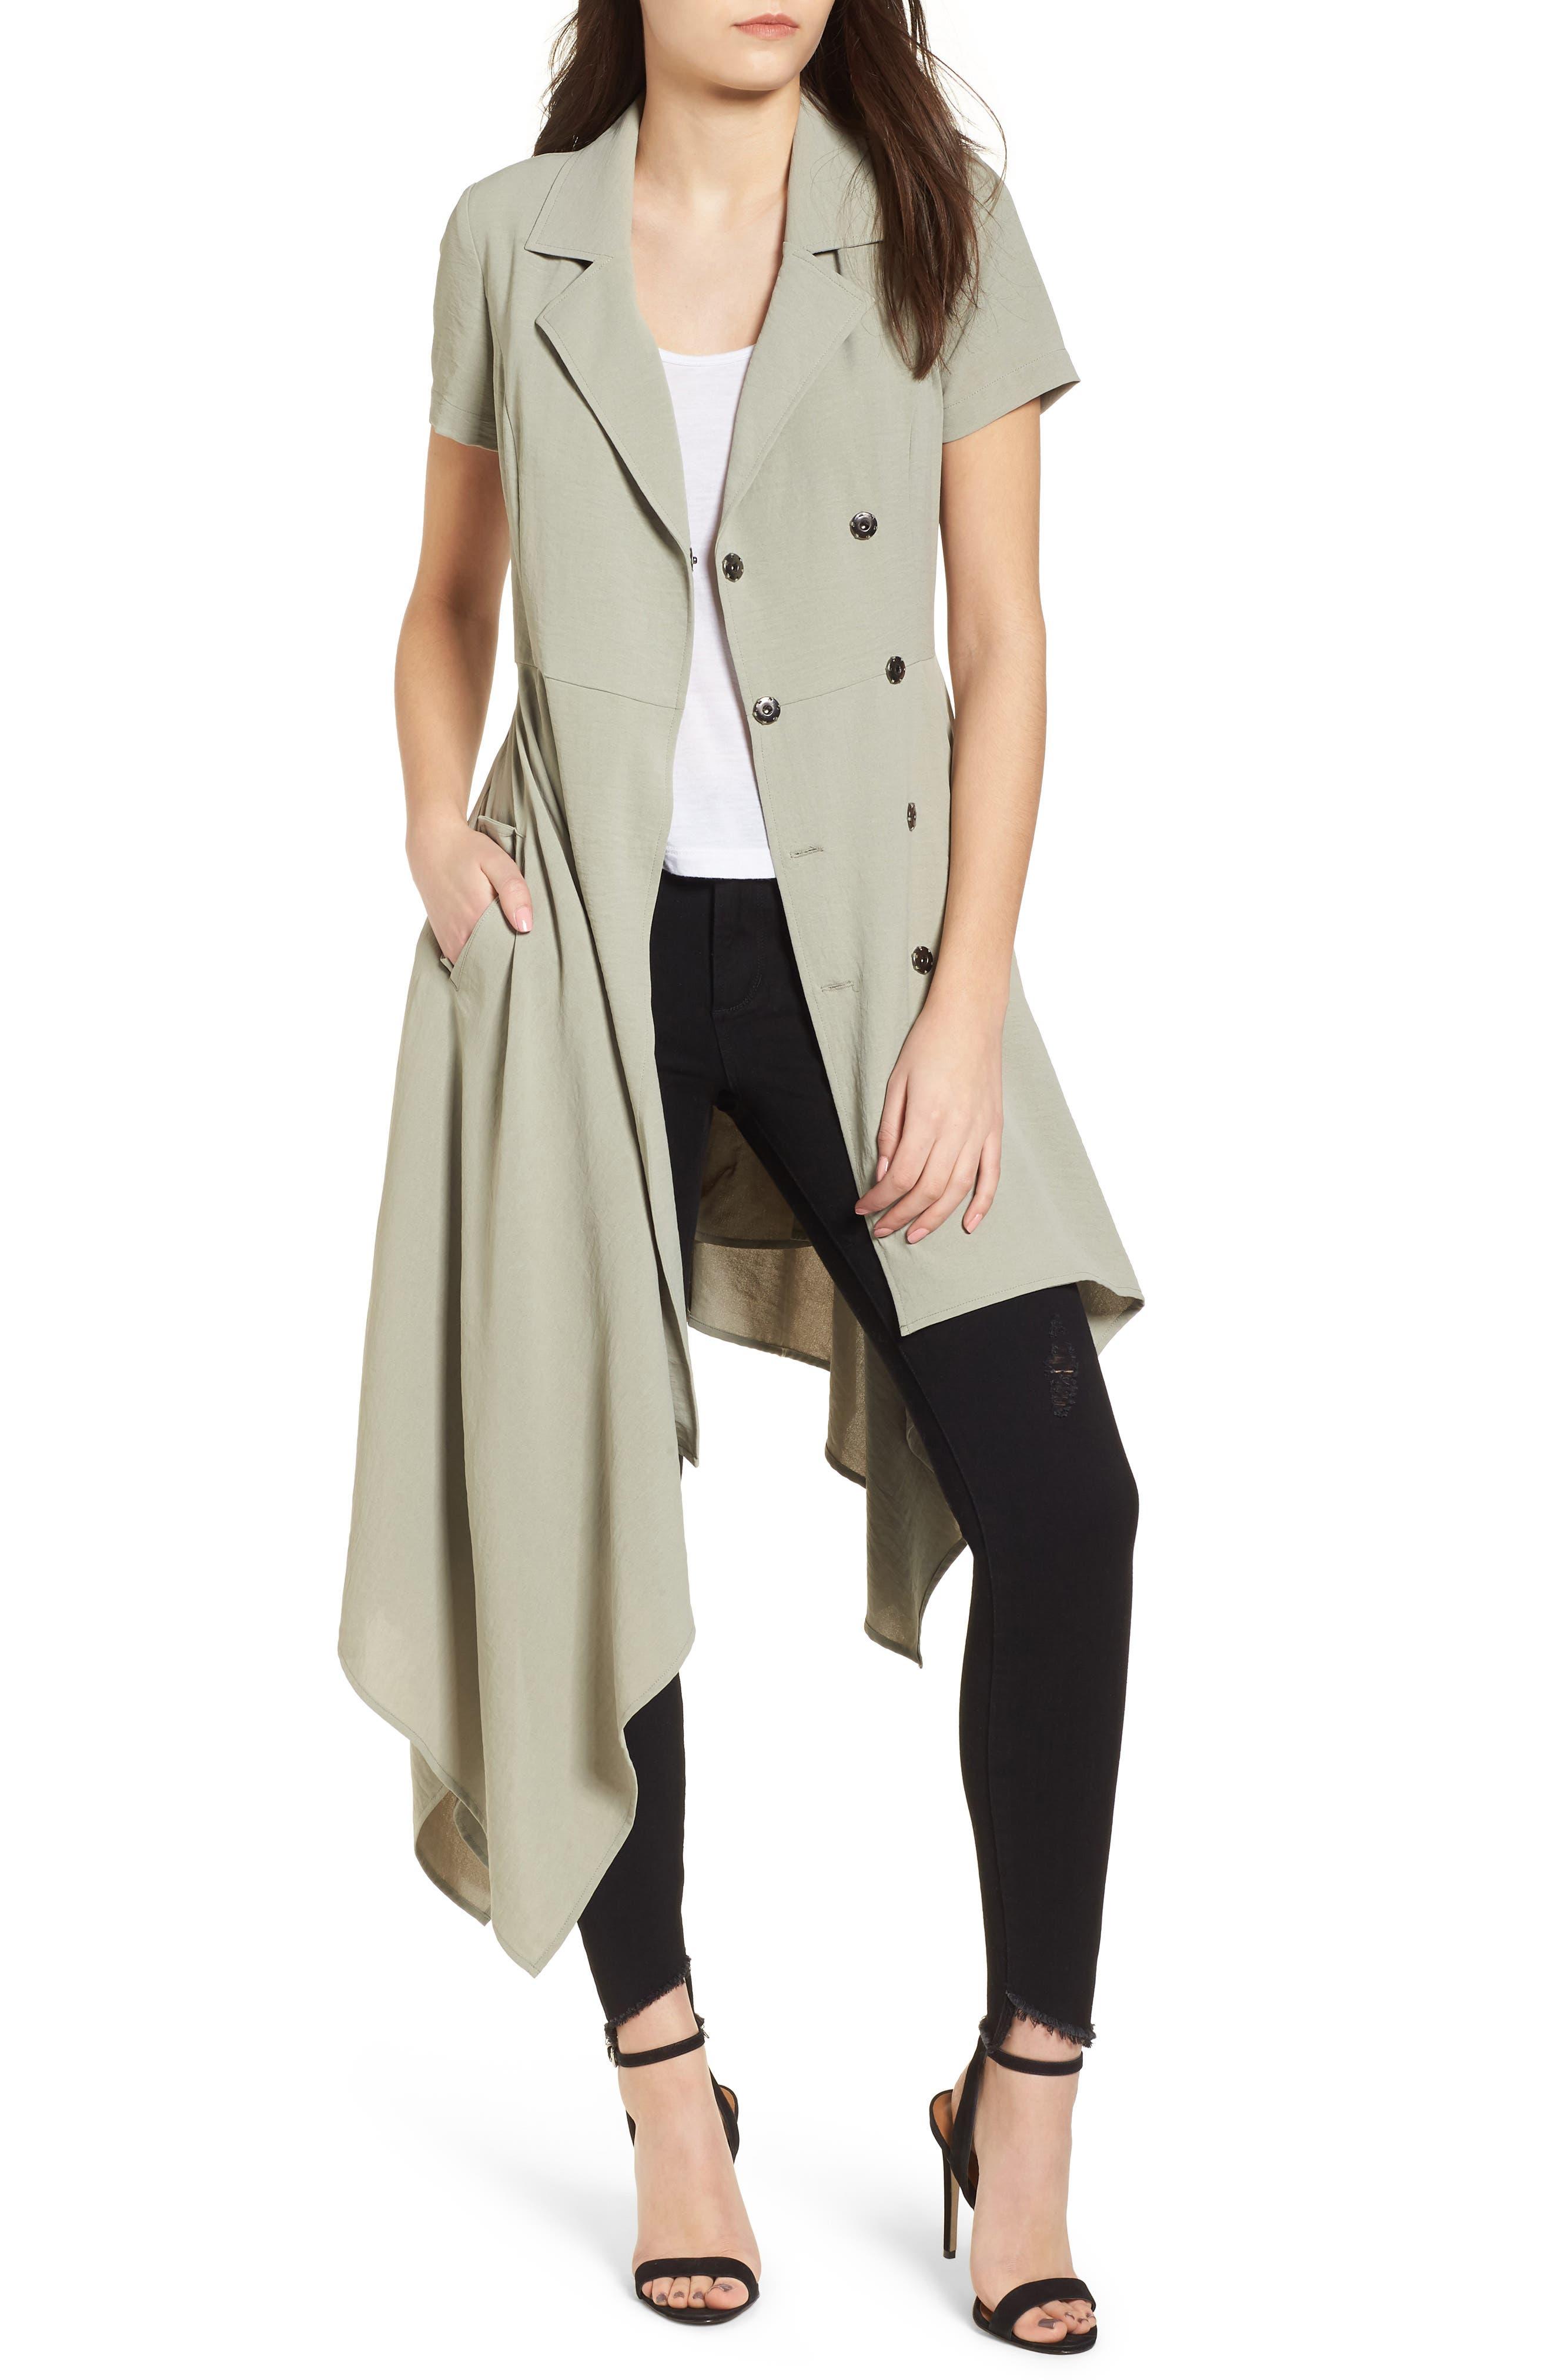 Chriselle x J.O.A. Asymmetrical Trench Dress,                             Alternate thumbnail 3, color,                             300